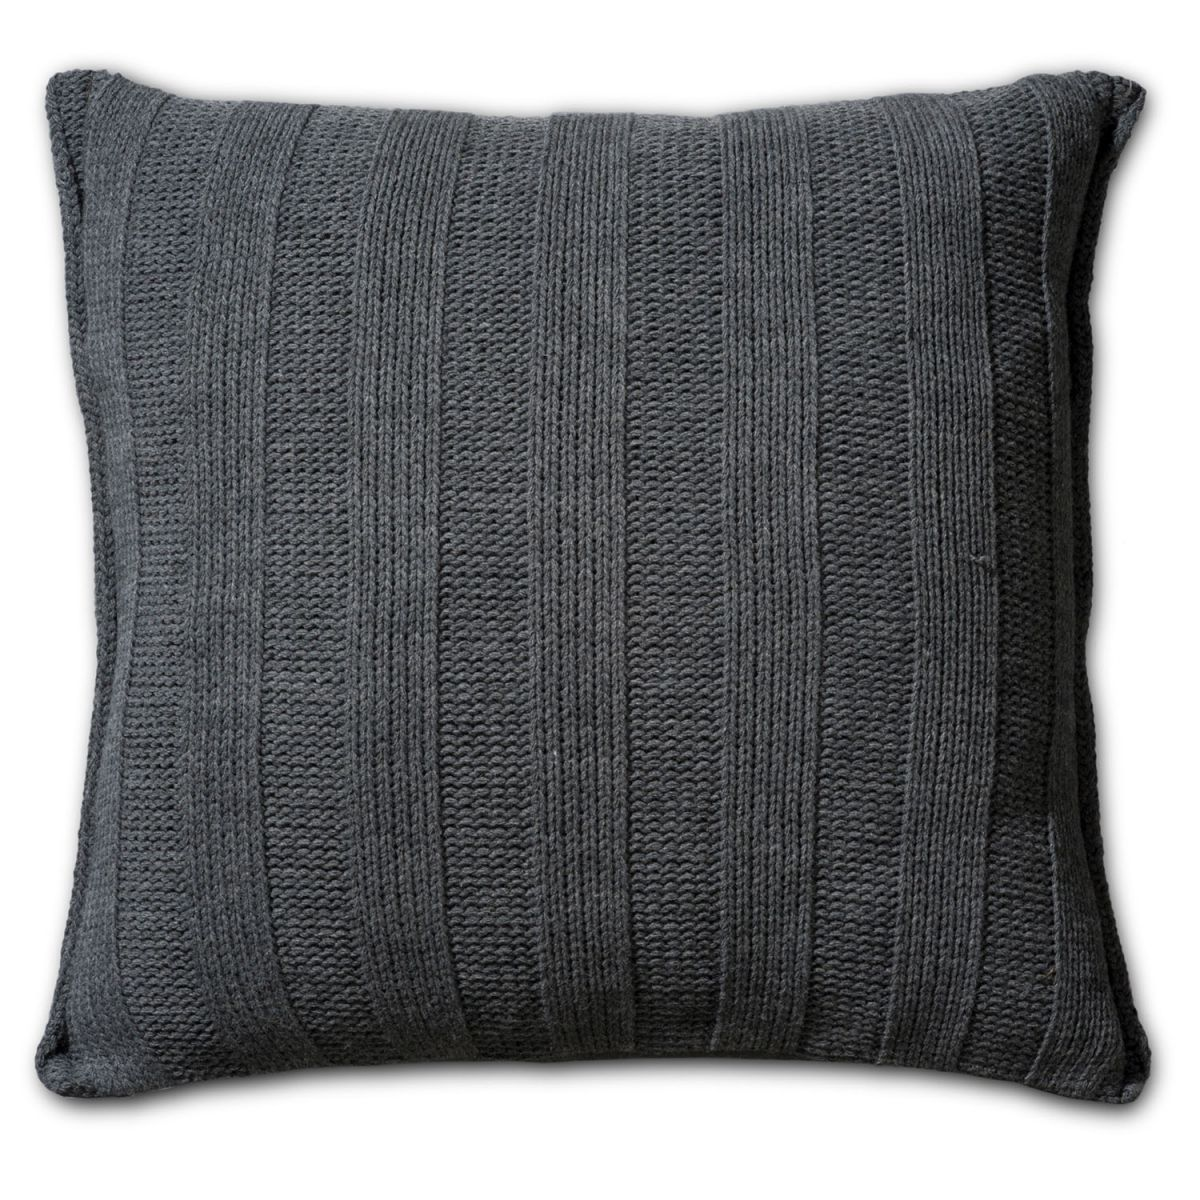 knit factory 1121210 kussen 50x50 6x6 rib antraciet 2